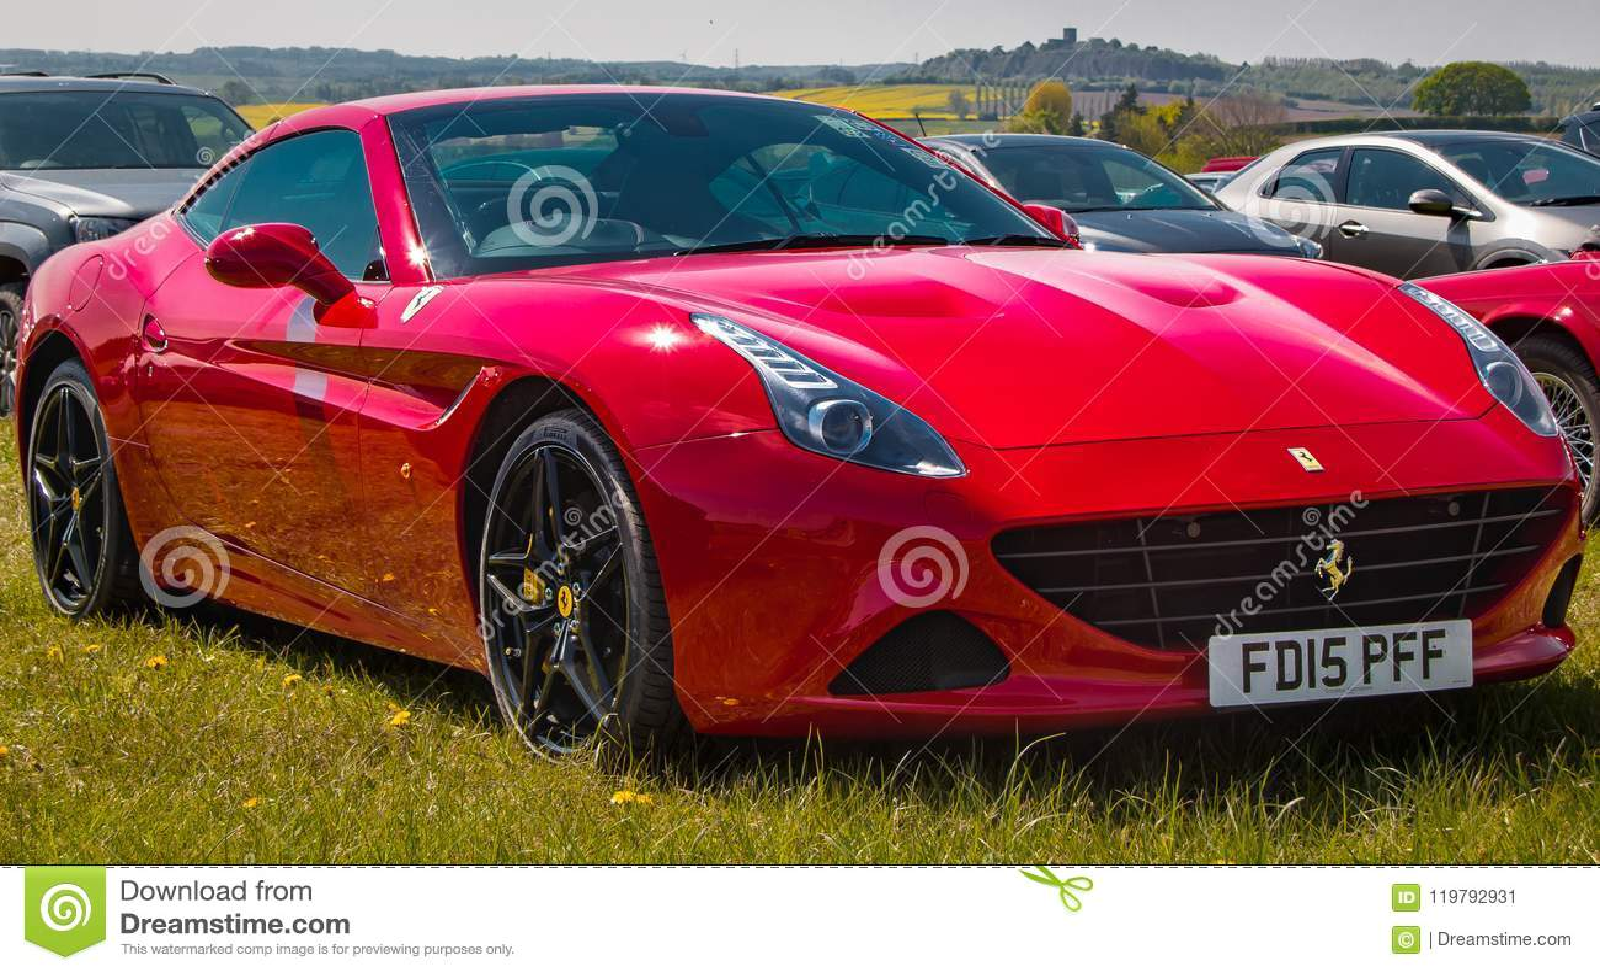 Red Ferrari California T Editorial Photo Image Of Automotive 119792931